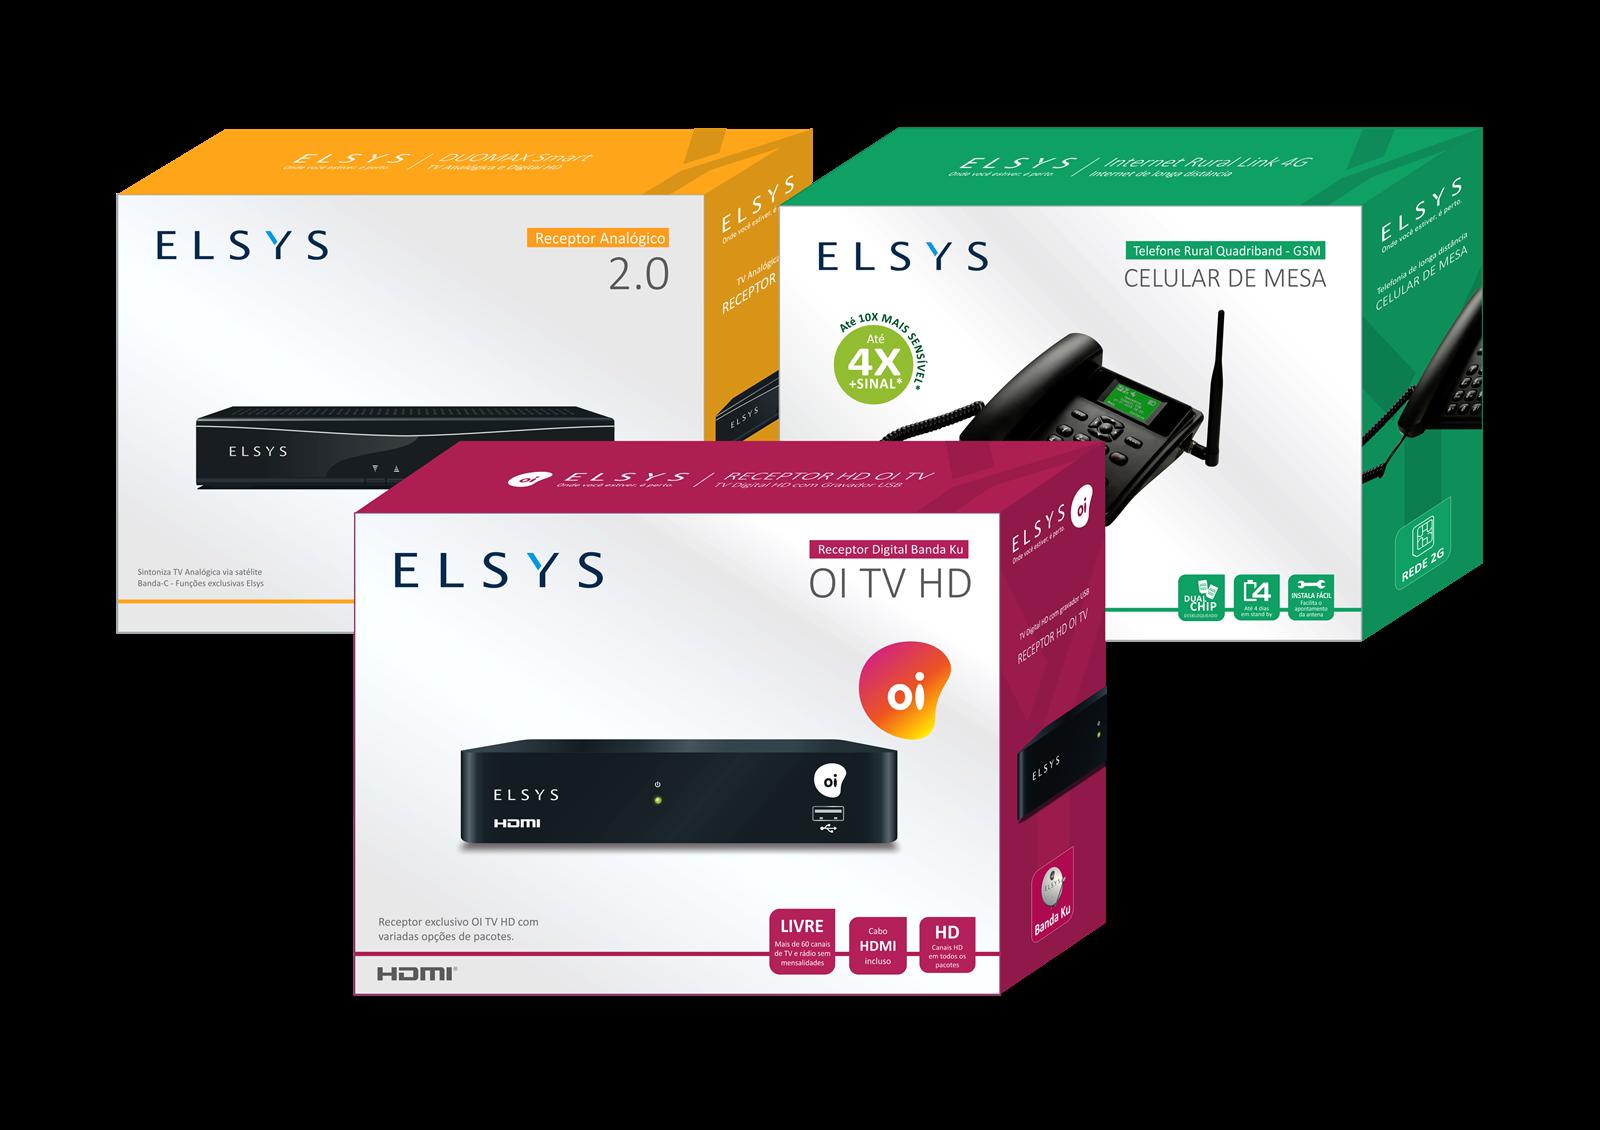 Elsys_Novas Embalagens 2017